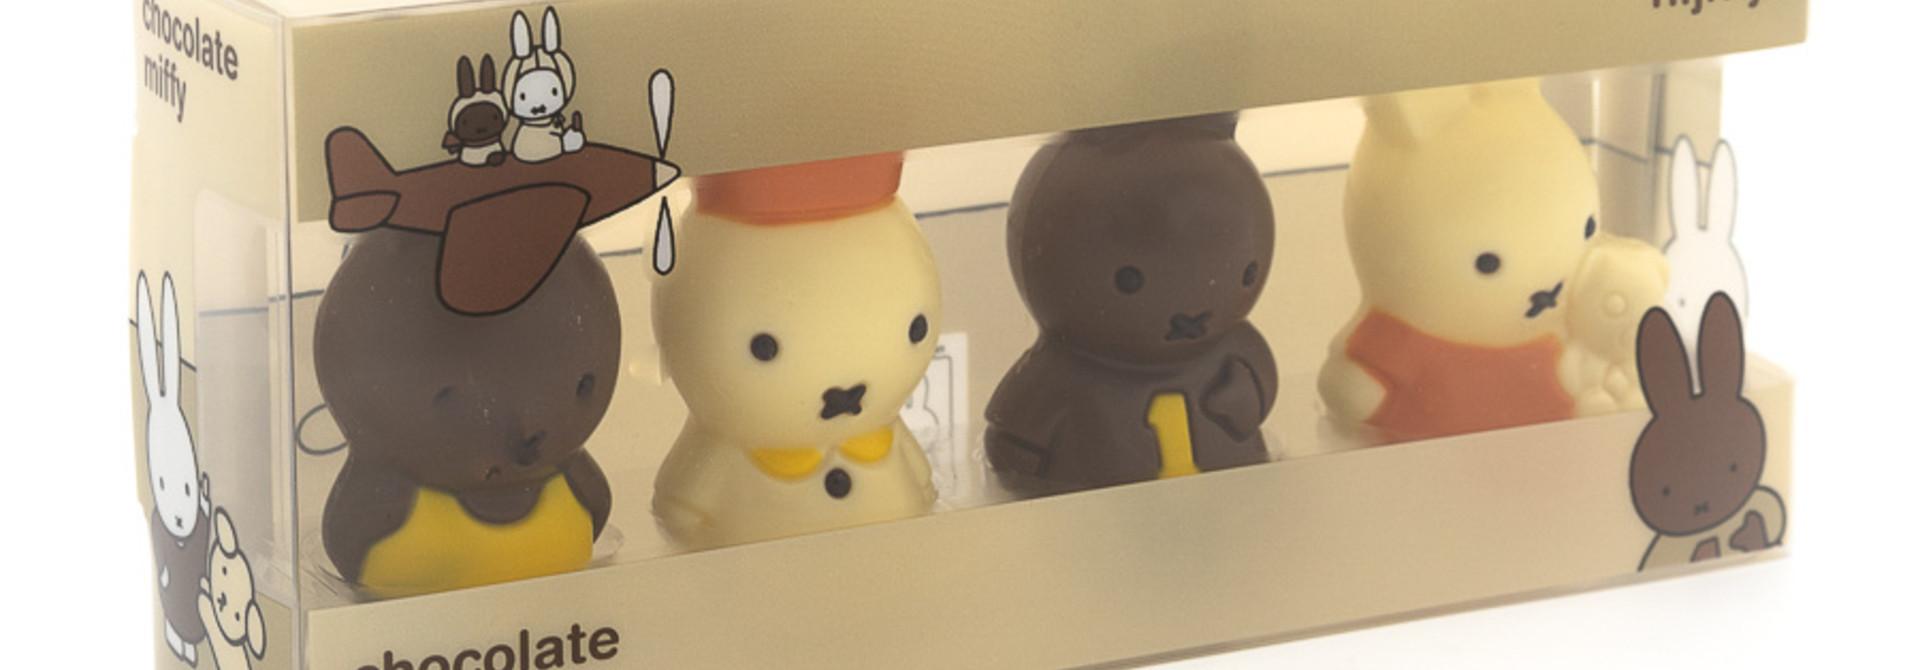 4 mini Miffy figurines